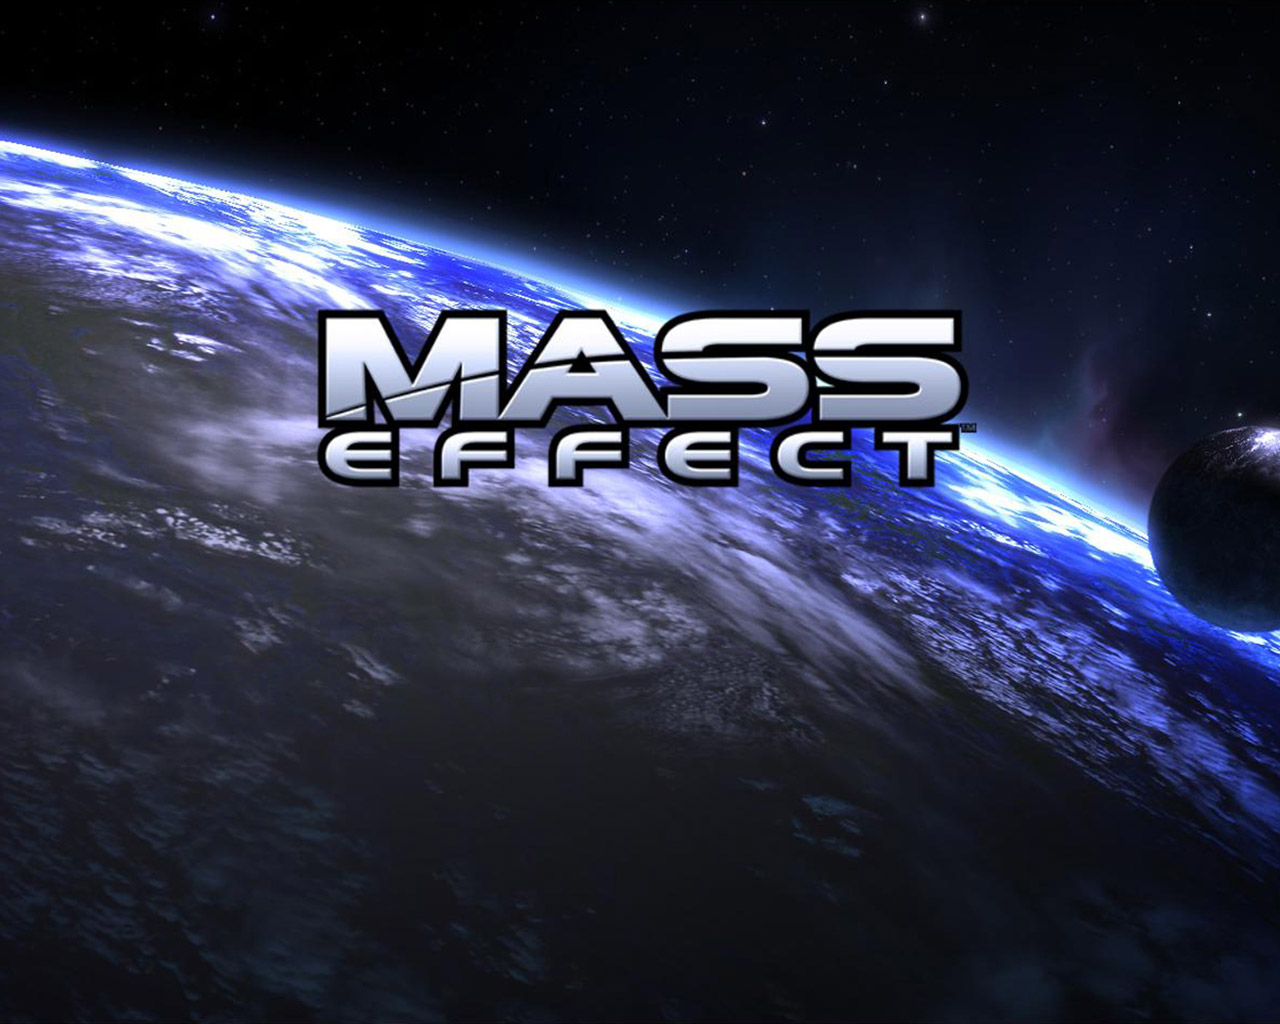 Free Mass Effect Wallpaper in 1280x1024